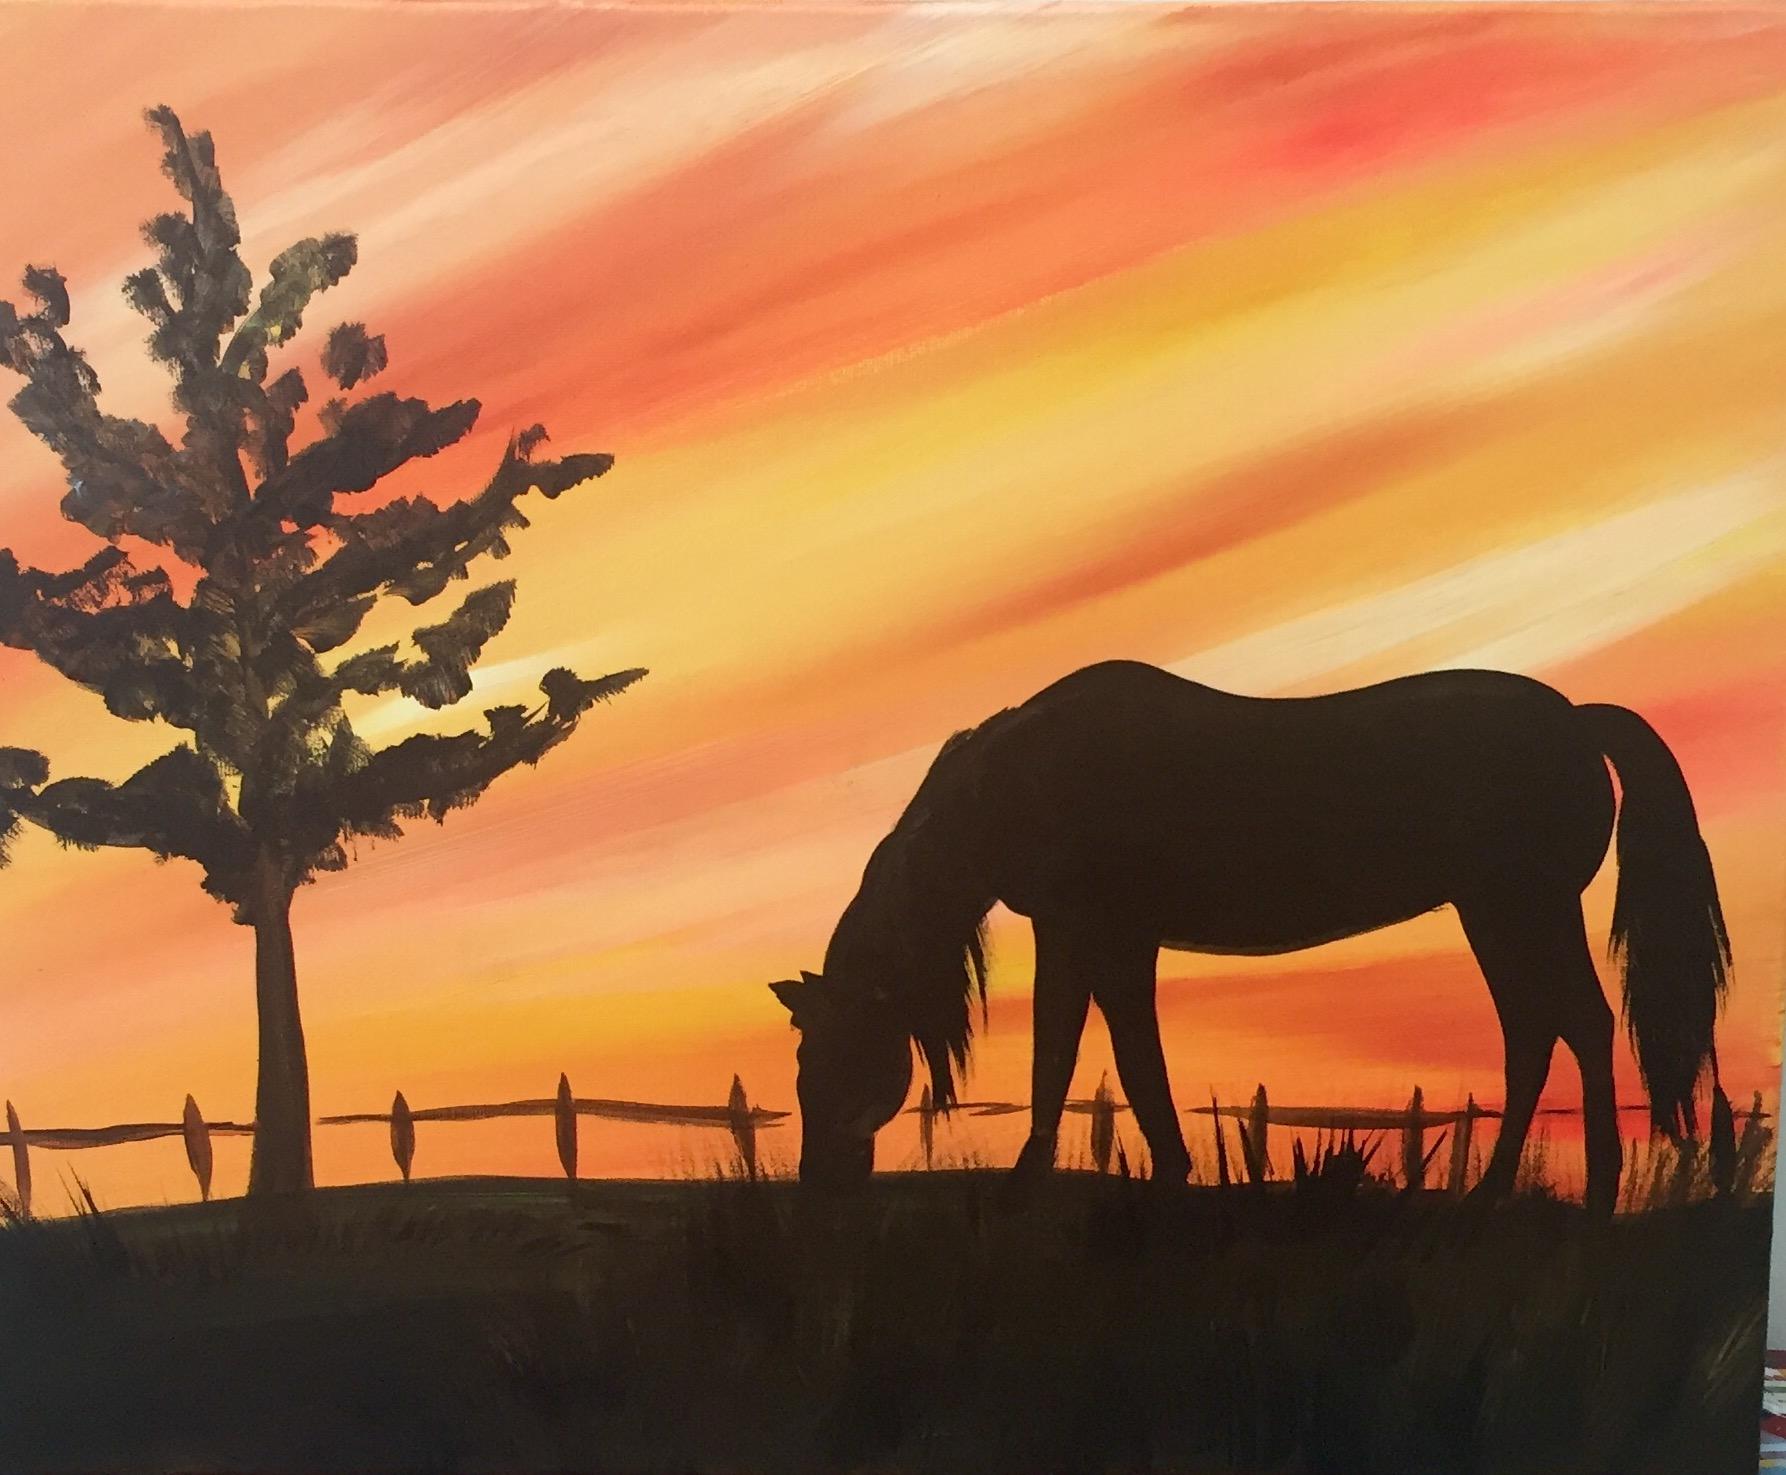 Deer Horse Elephant Sunset Sip Gogh